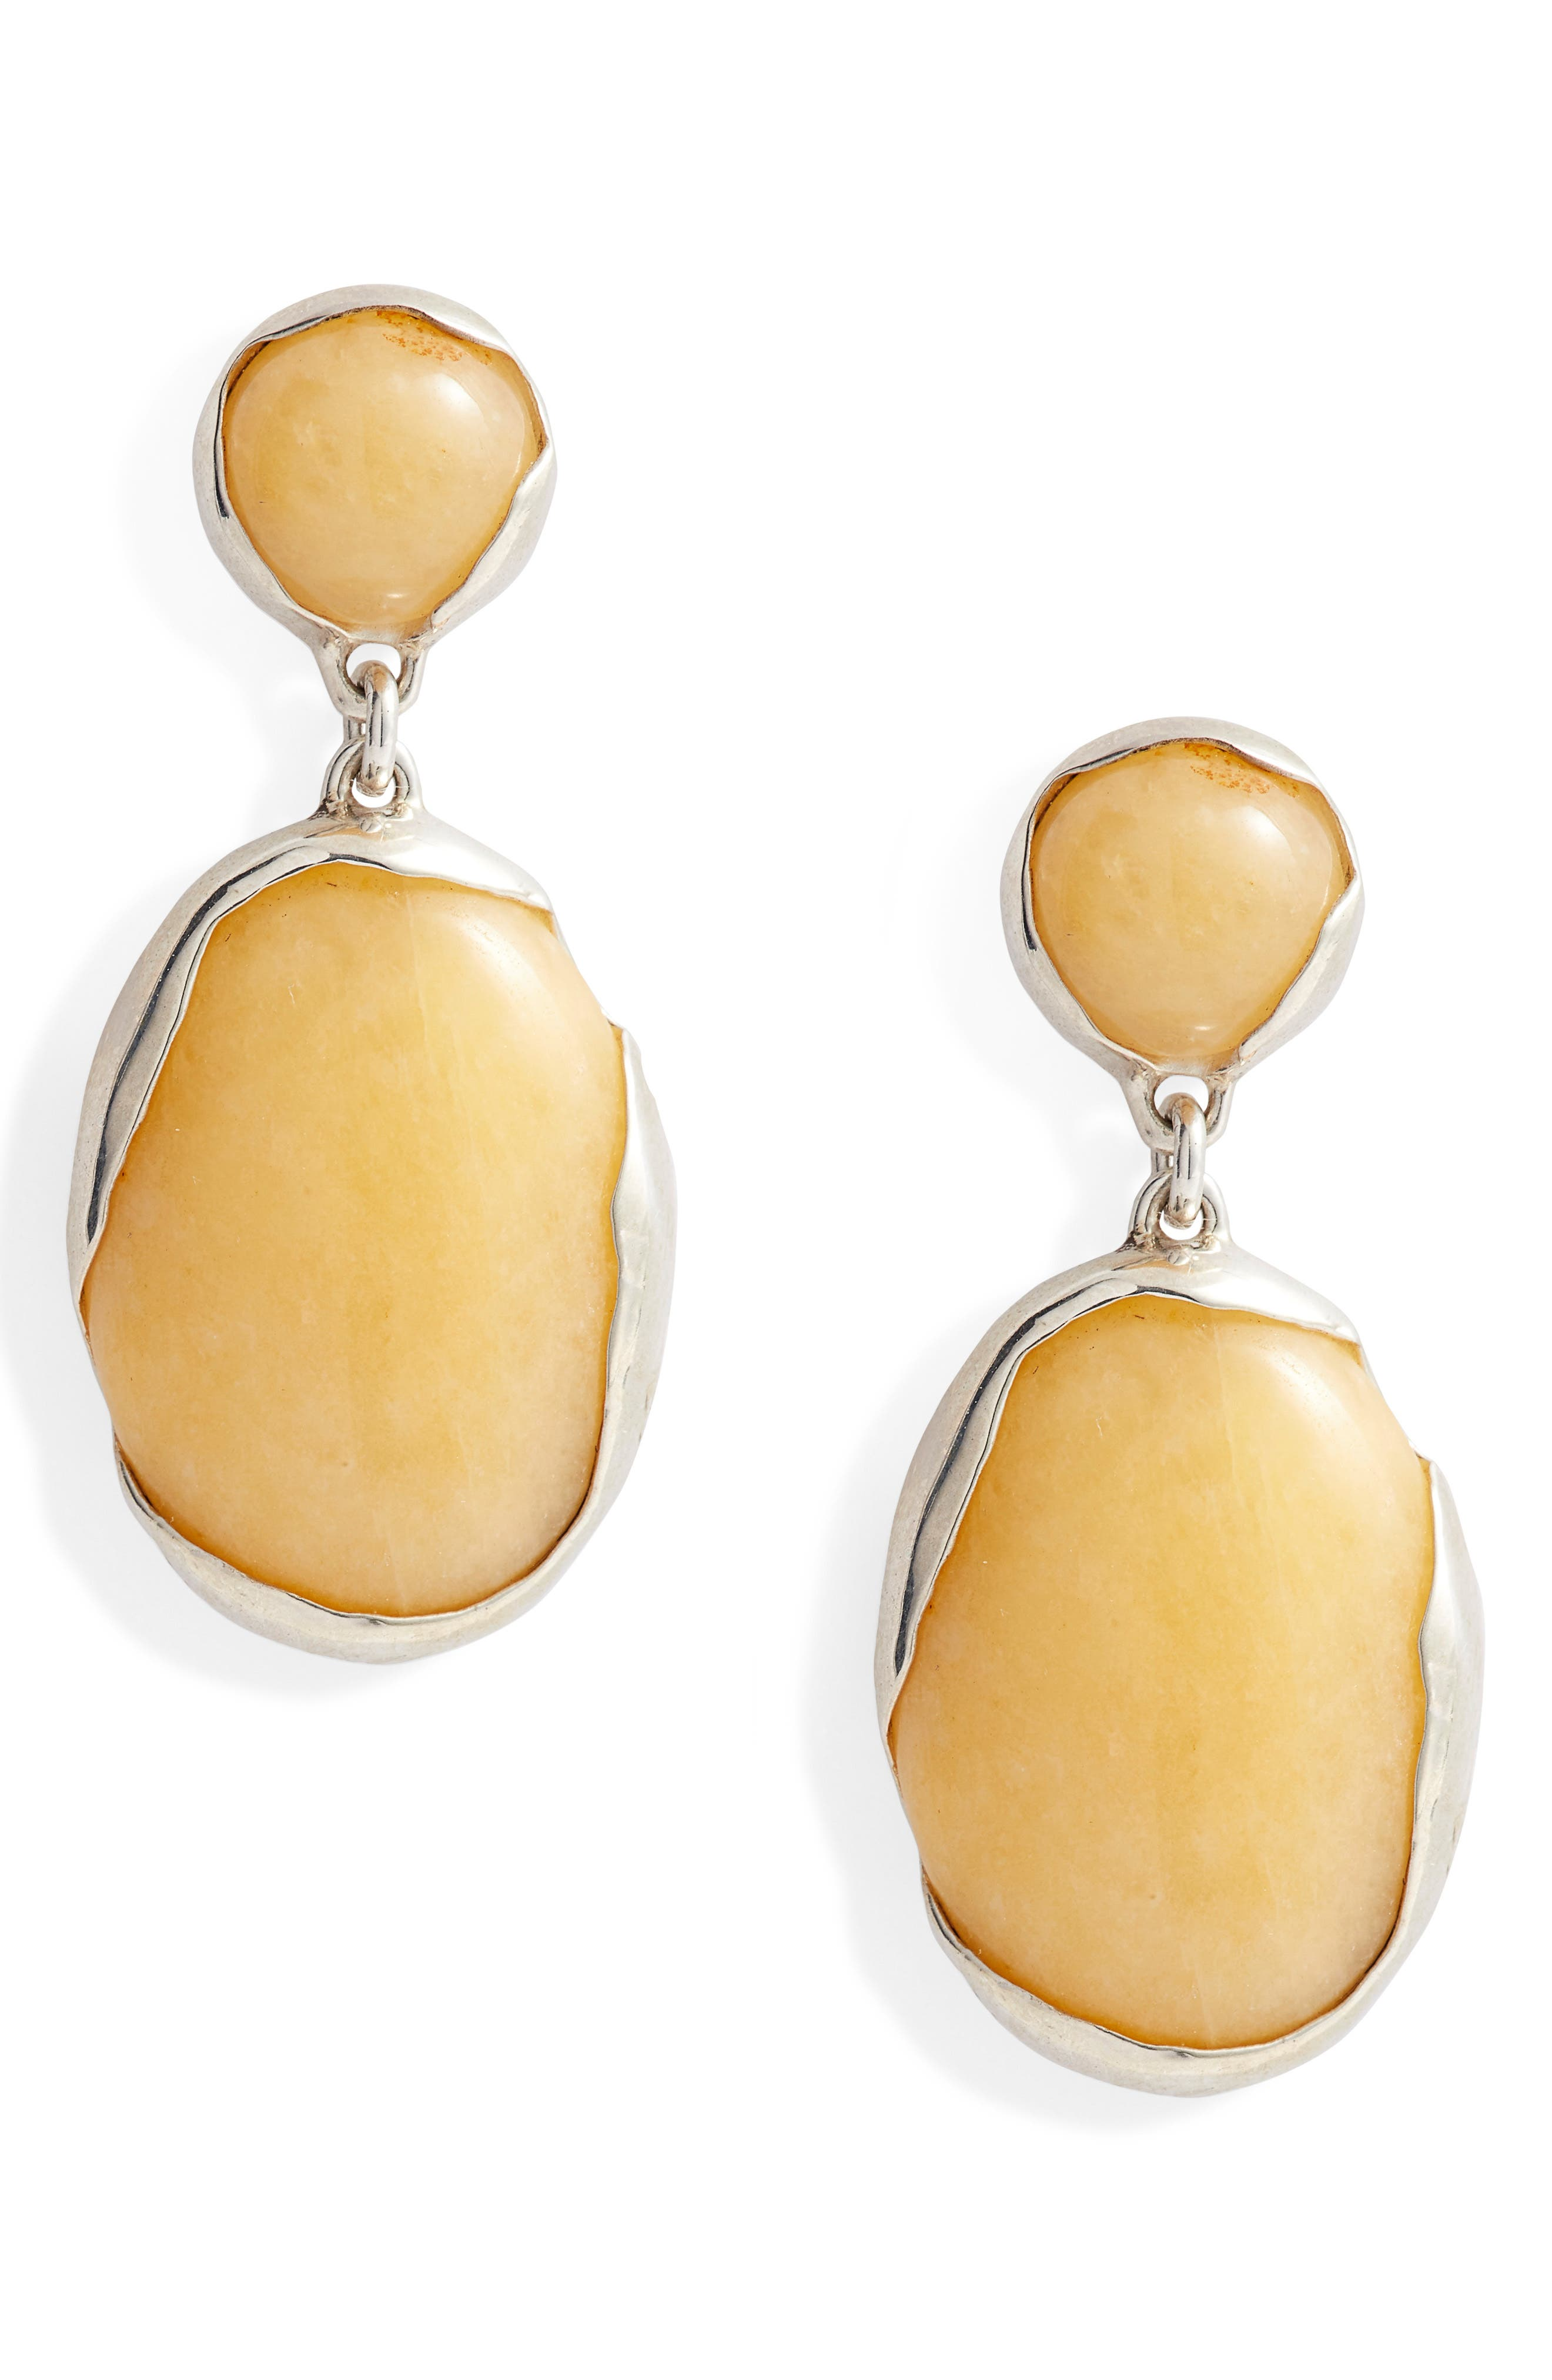 Ovo Stone Drop Earrings,                             Main thumbnail 1, color,                             SILVER/ PINEAPPLE JASPER